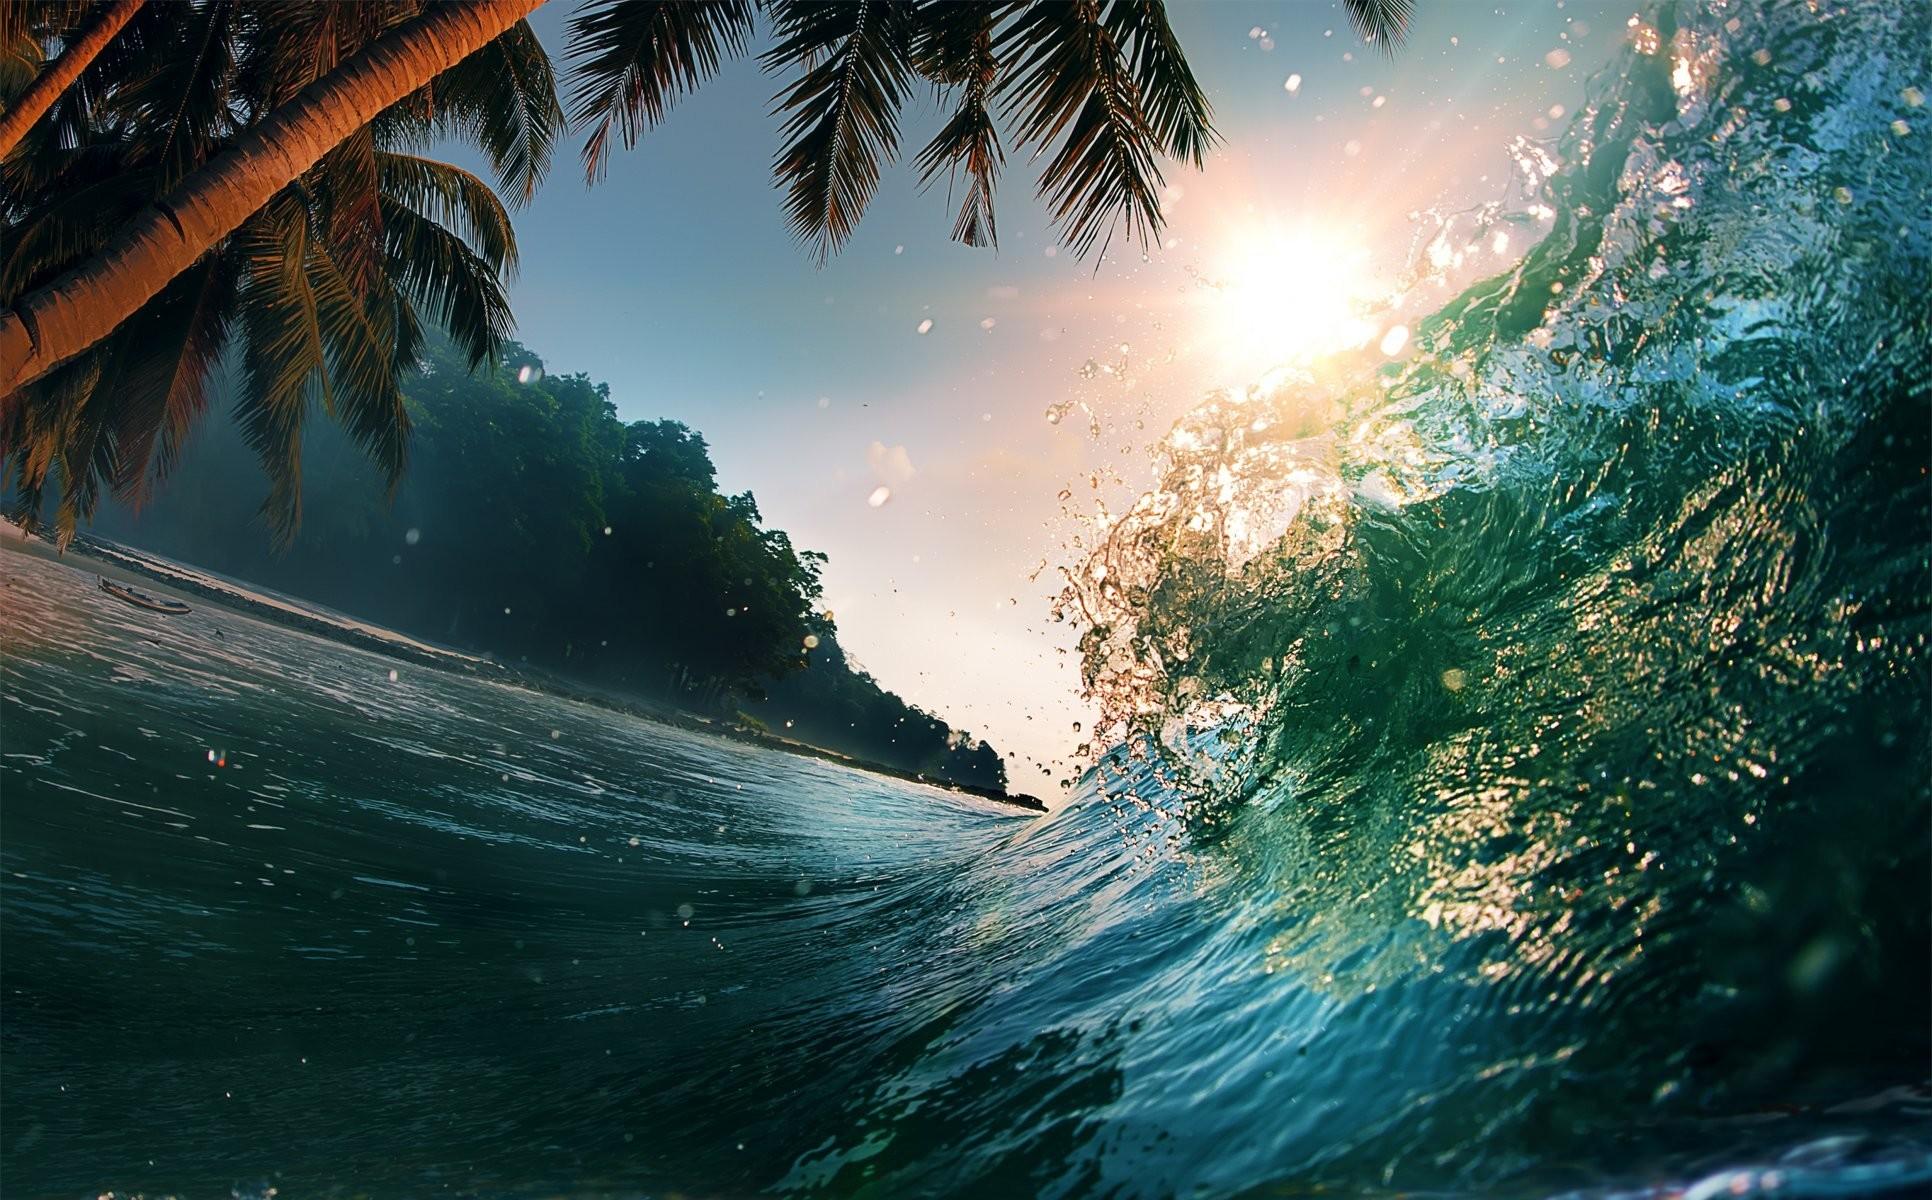 sea wave beautiful sunset scene water splash tropical paradise ocean sea  waves sunlight nature